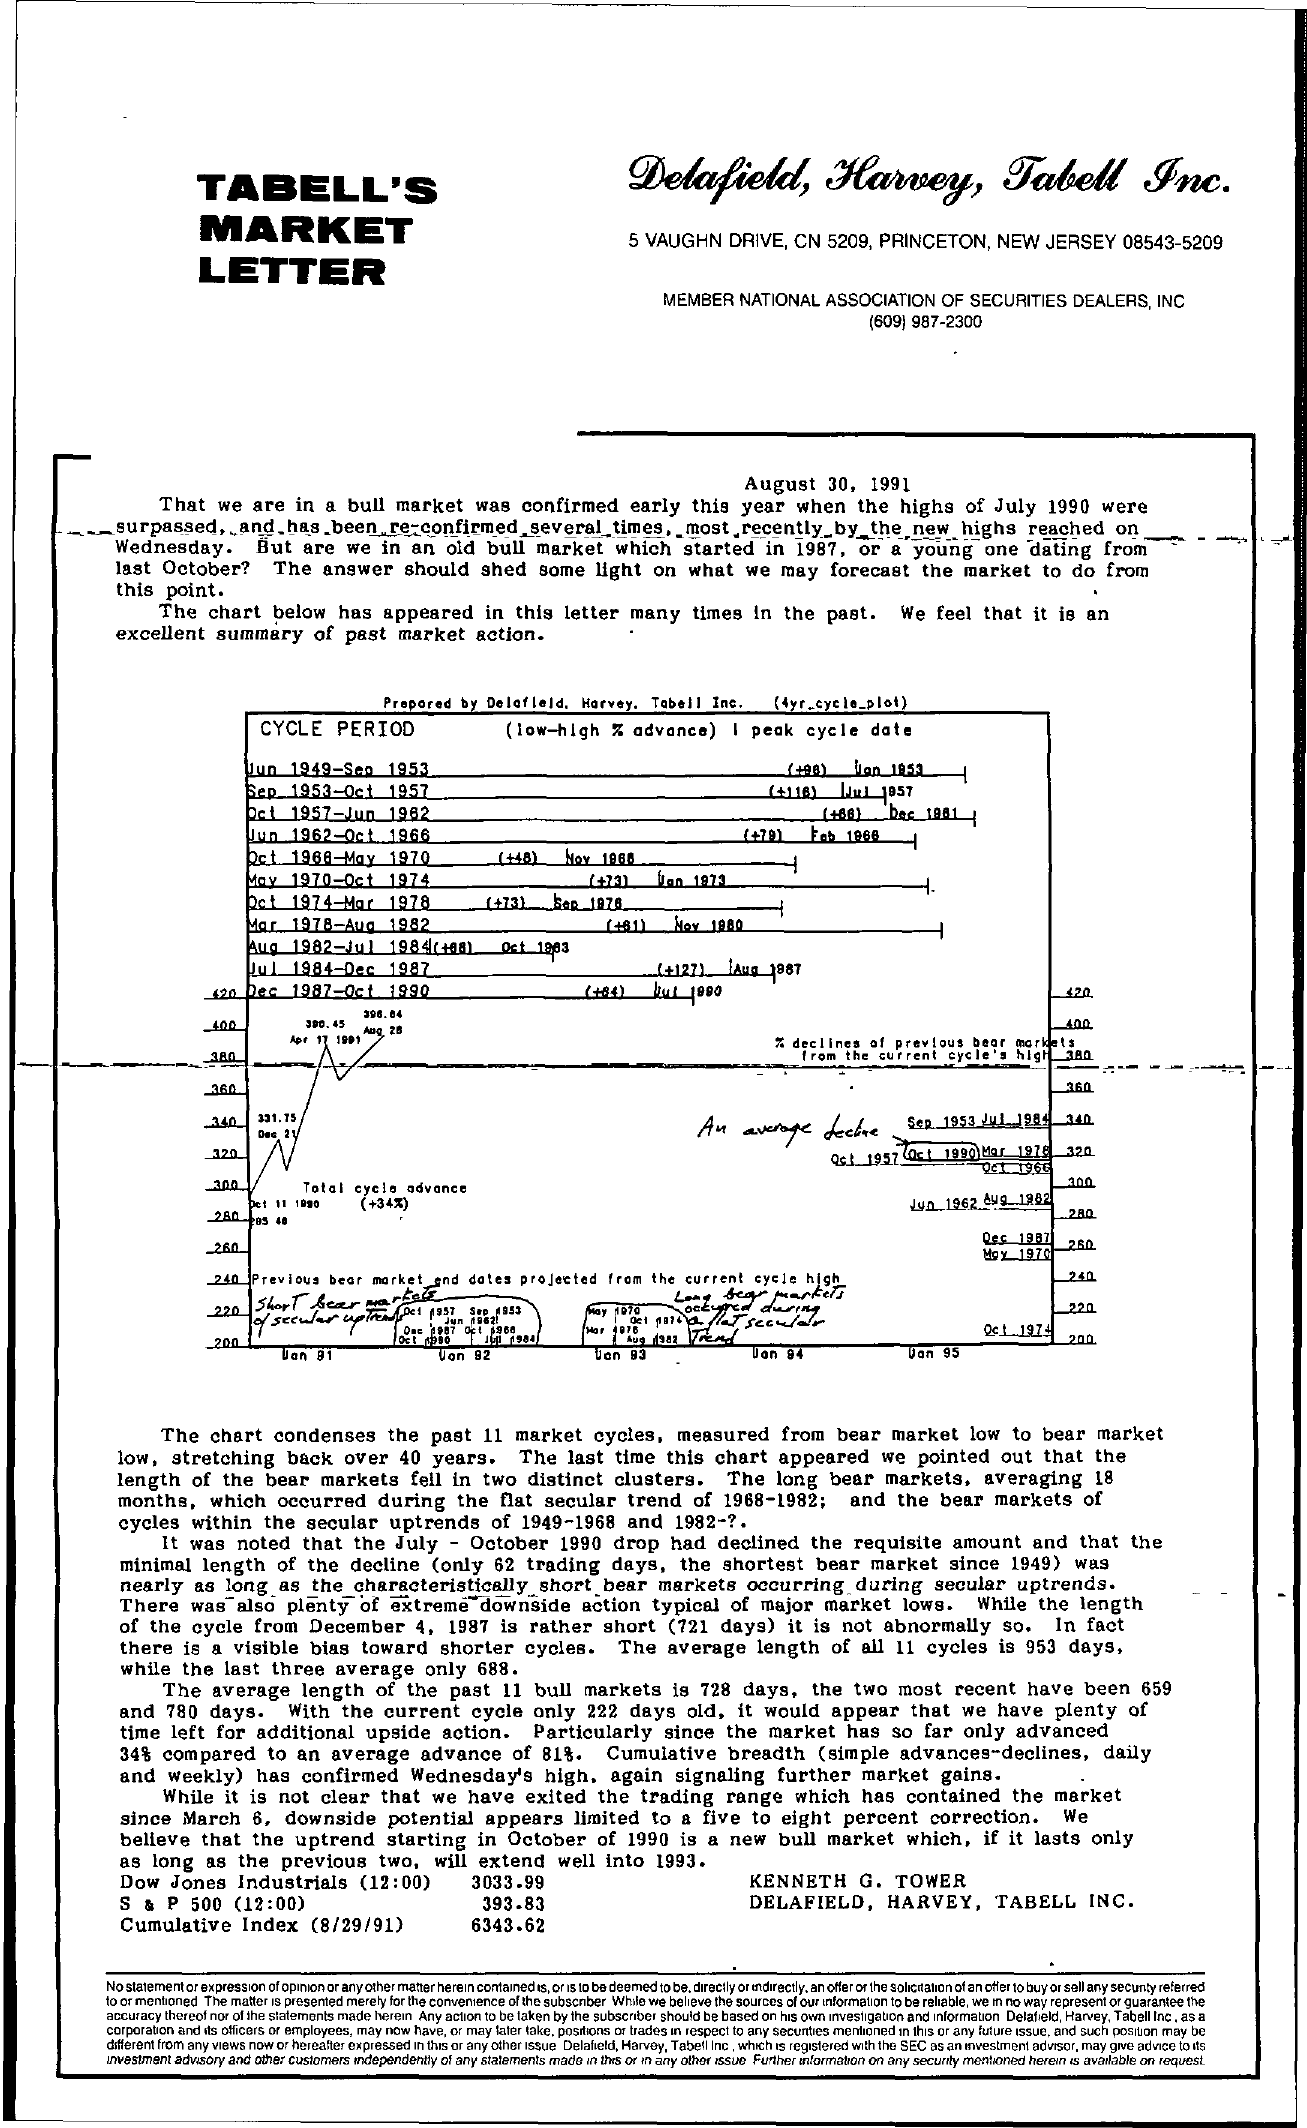 Tabell's Market Letter - August 30, 1991